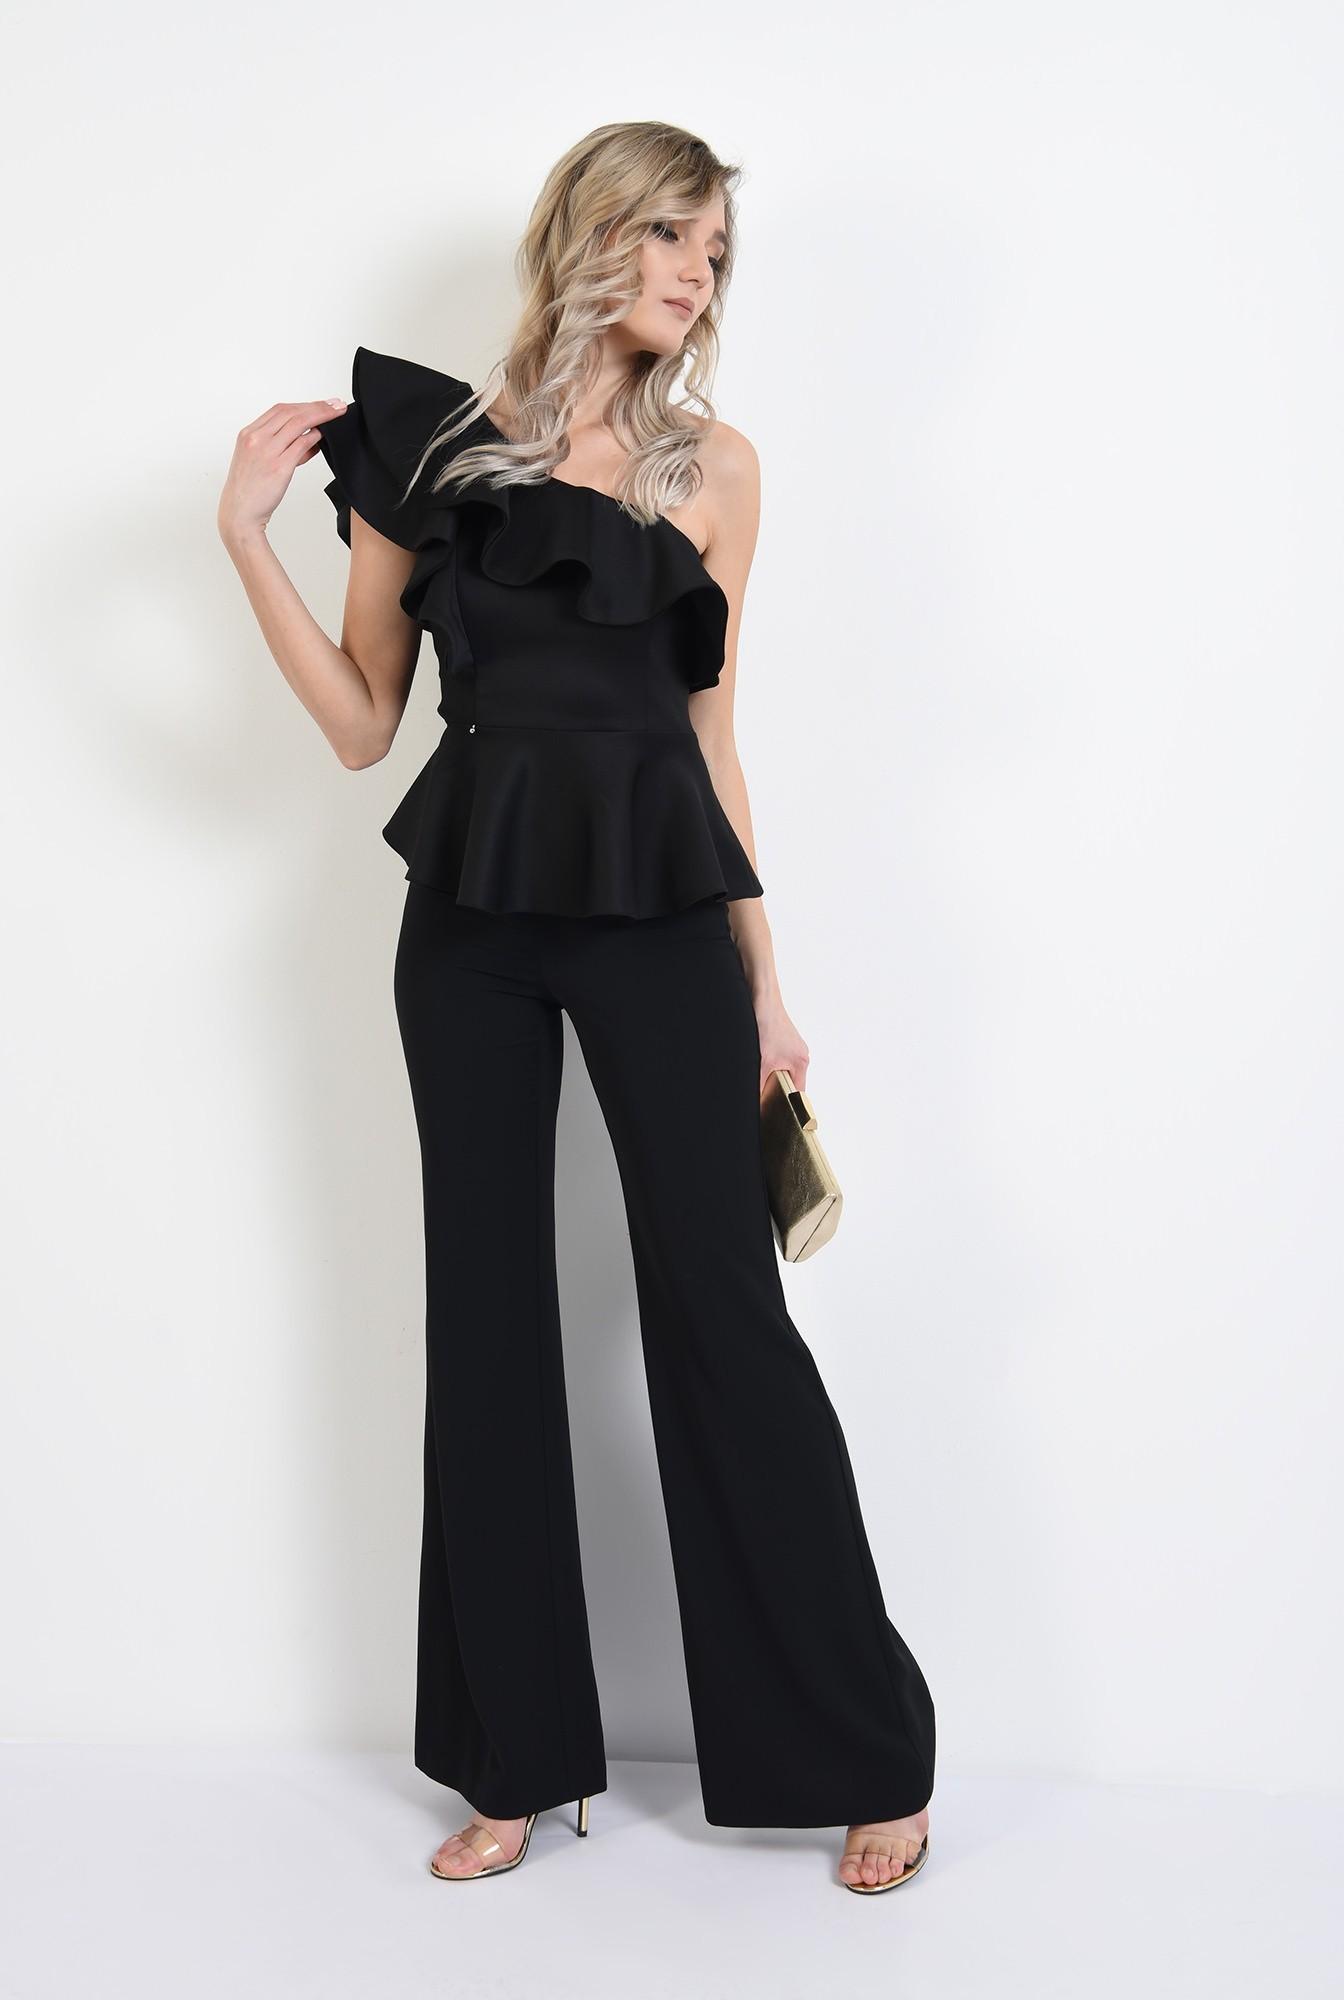 3 - 360 - bluza eleganta, neagra, cu volane, cu peplum, bluza de ocazie